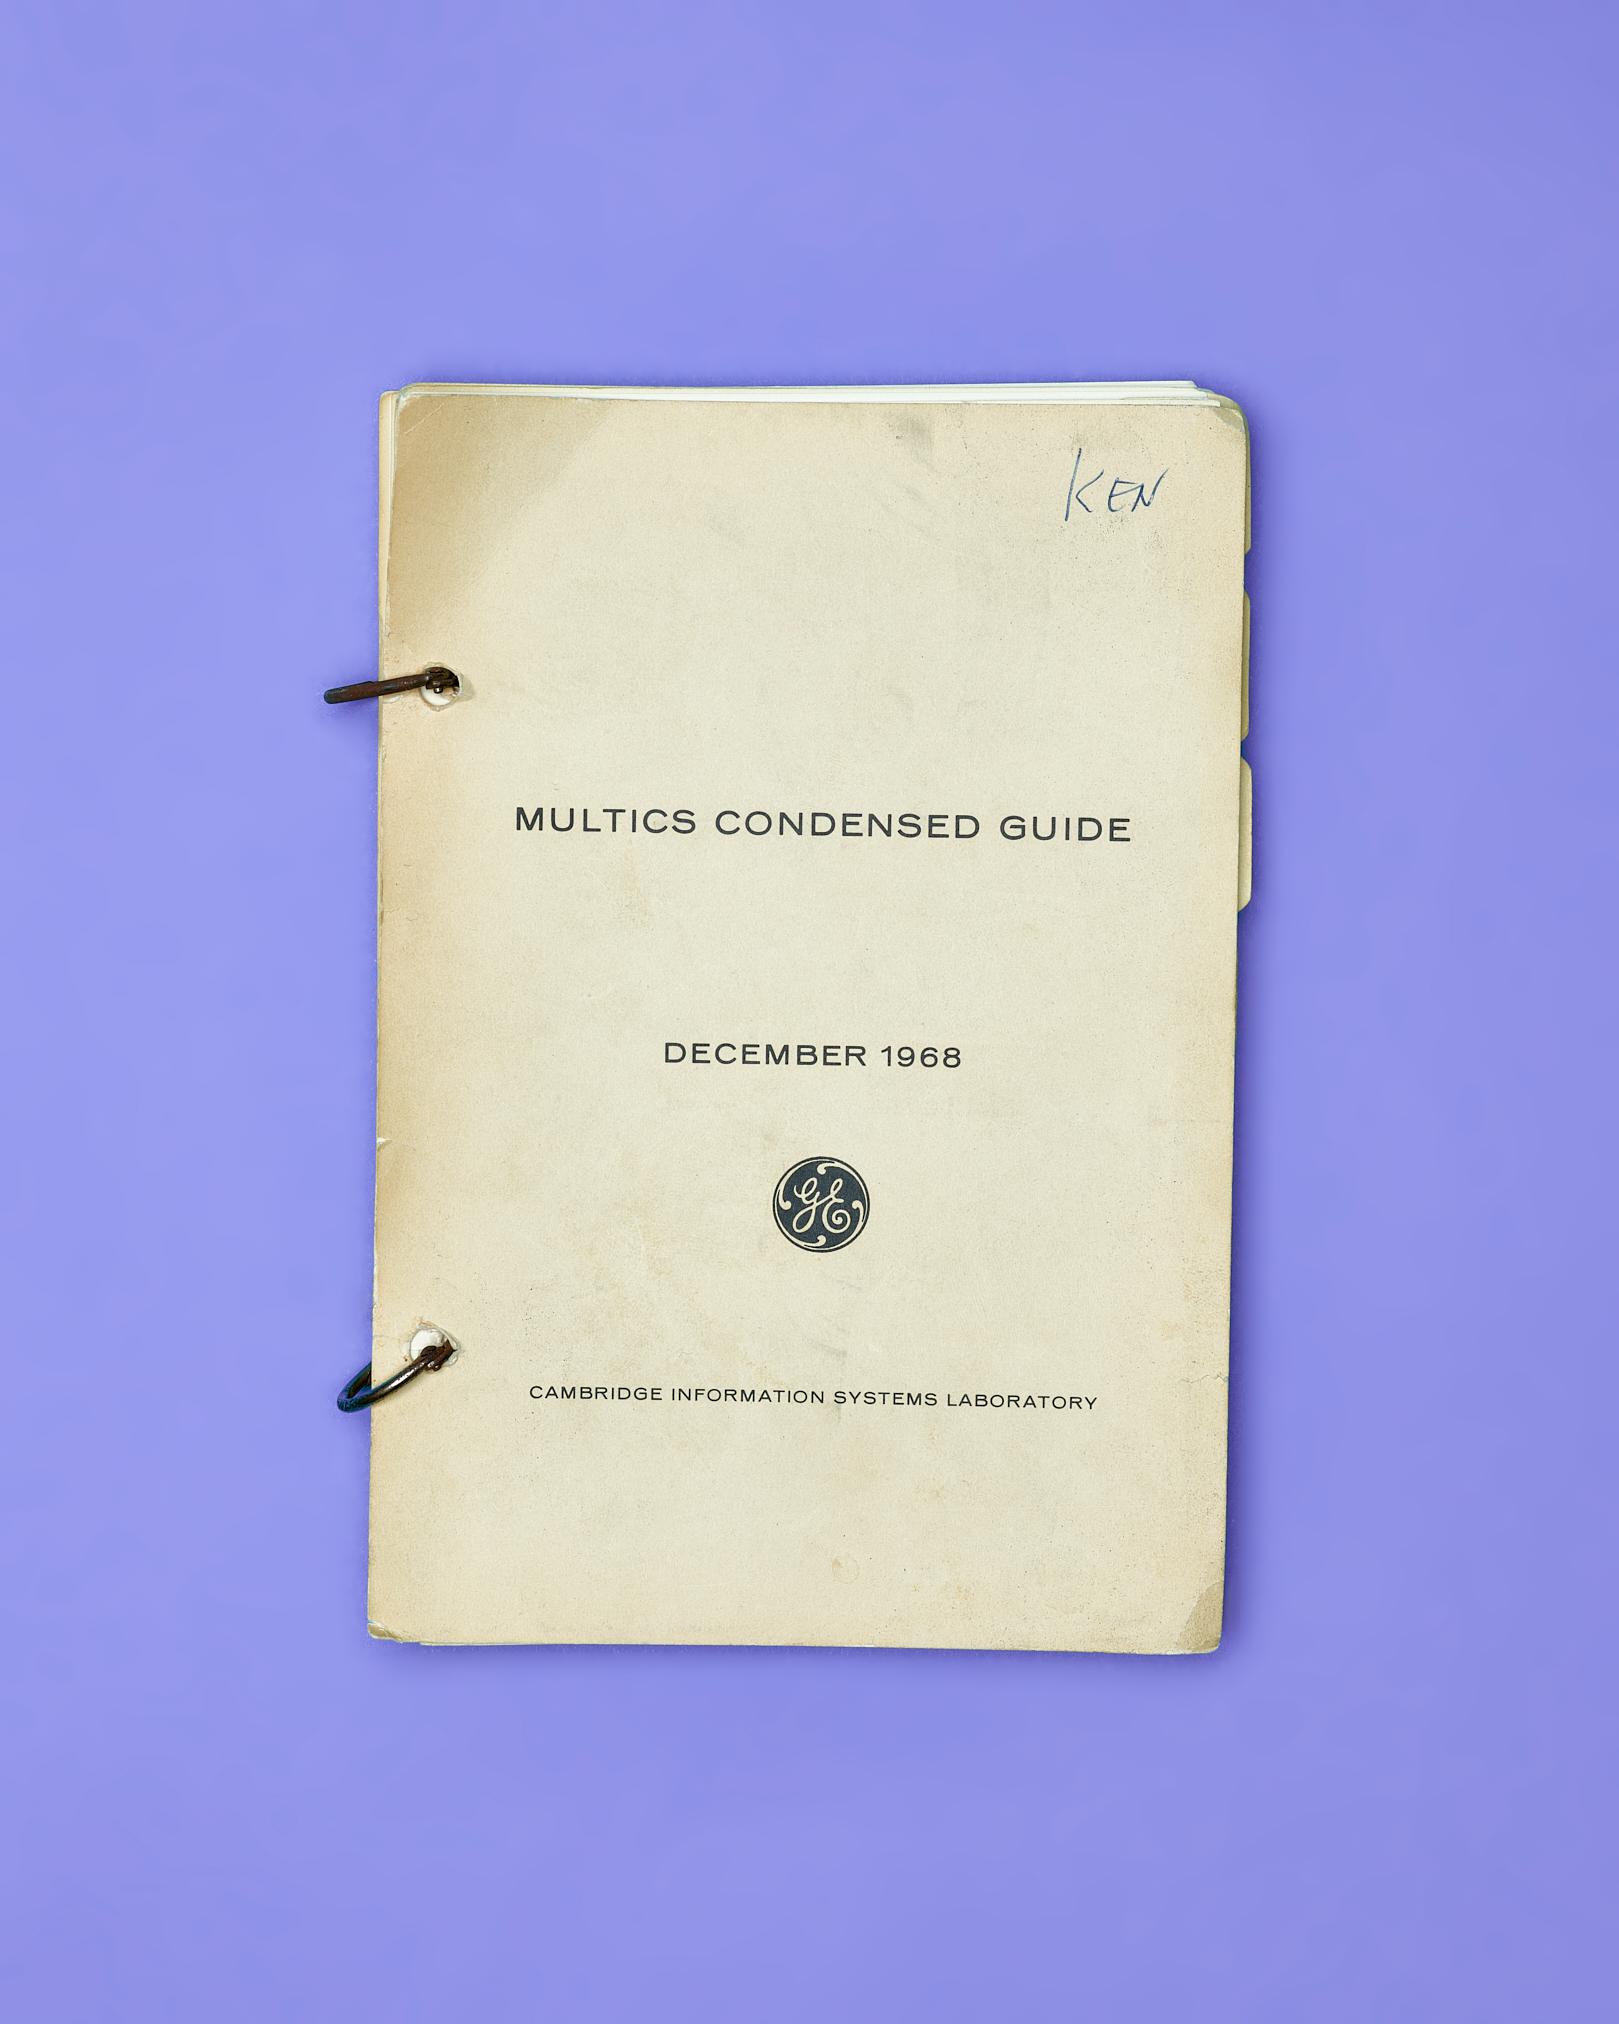 Multics Condensed Guide by Peter Adams.